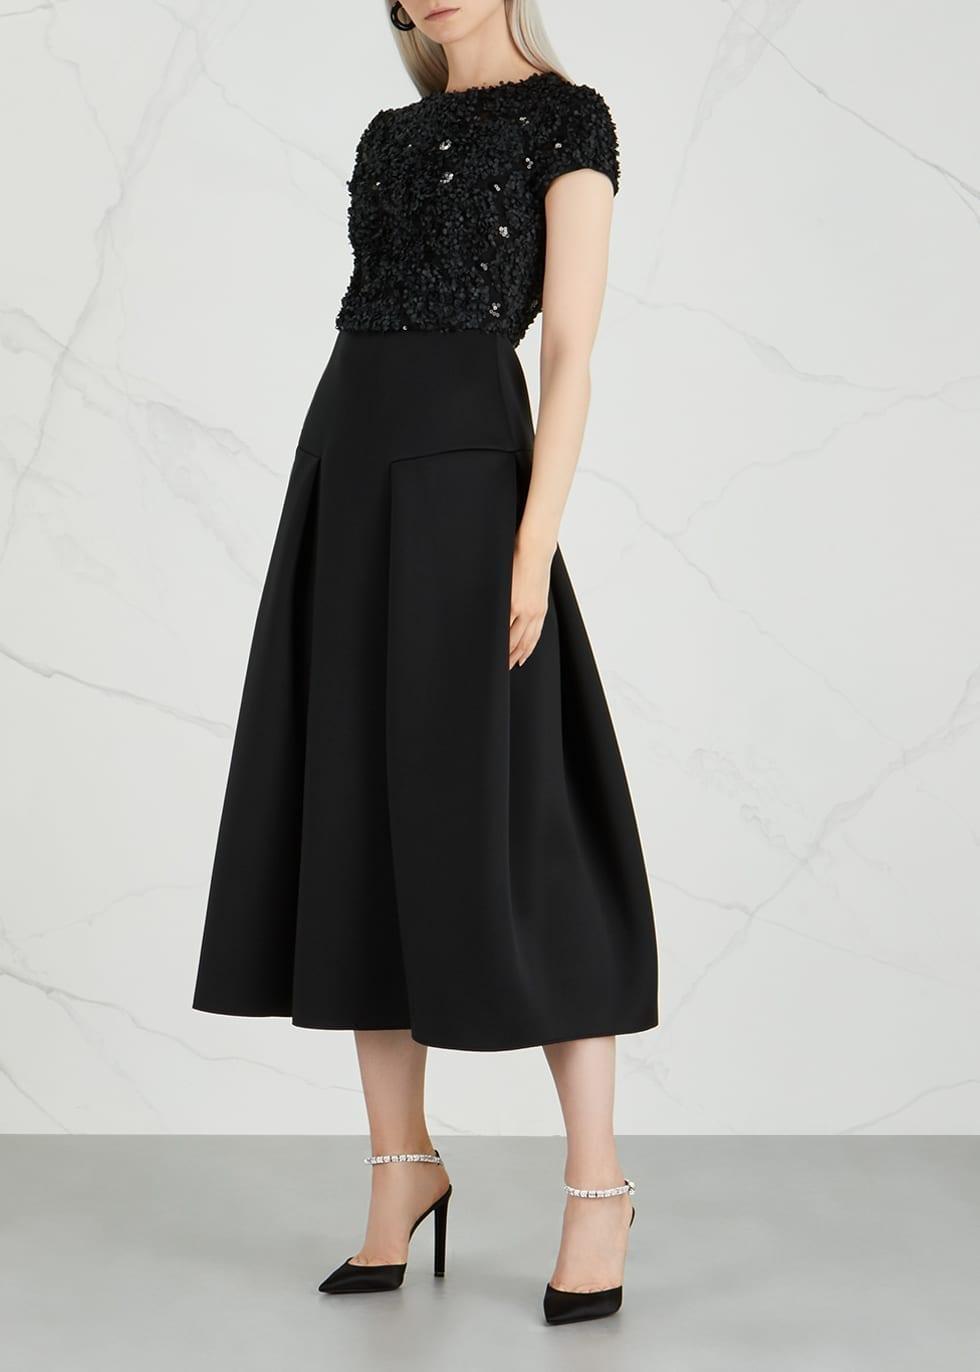 Emporio Armani Fl Liquéd Neoprene Black Dress